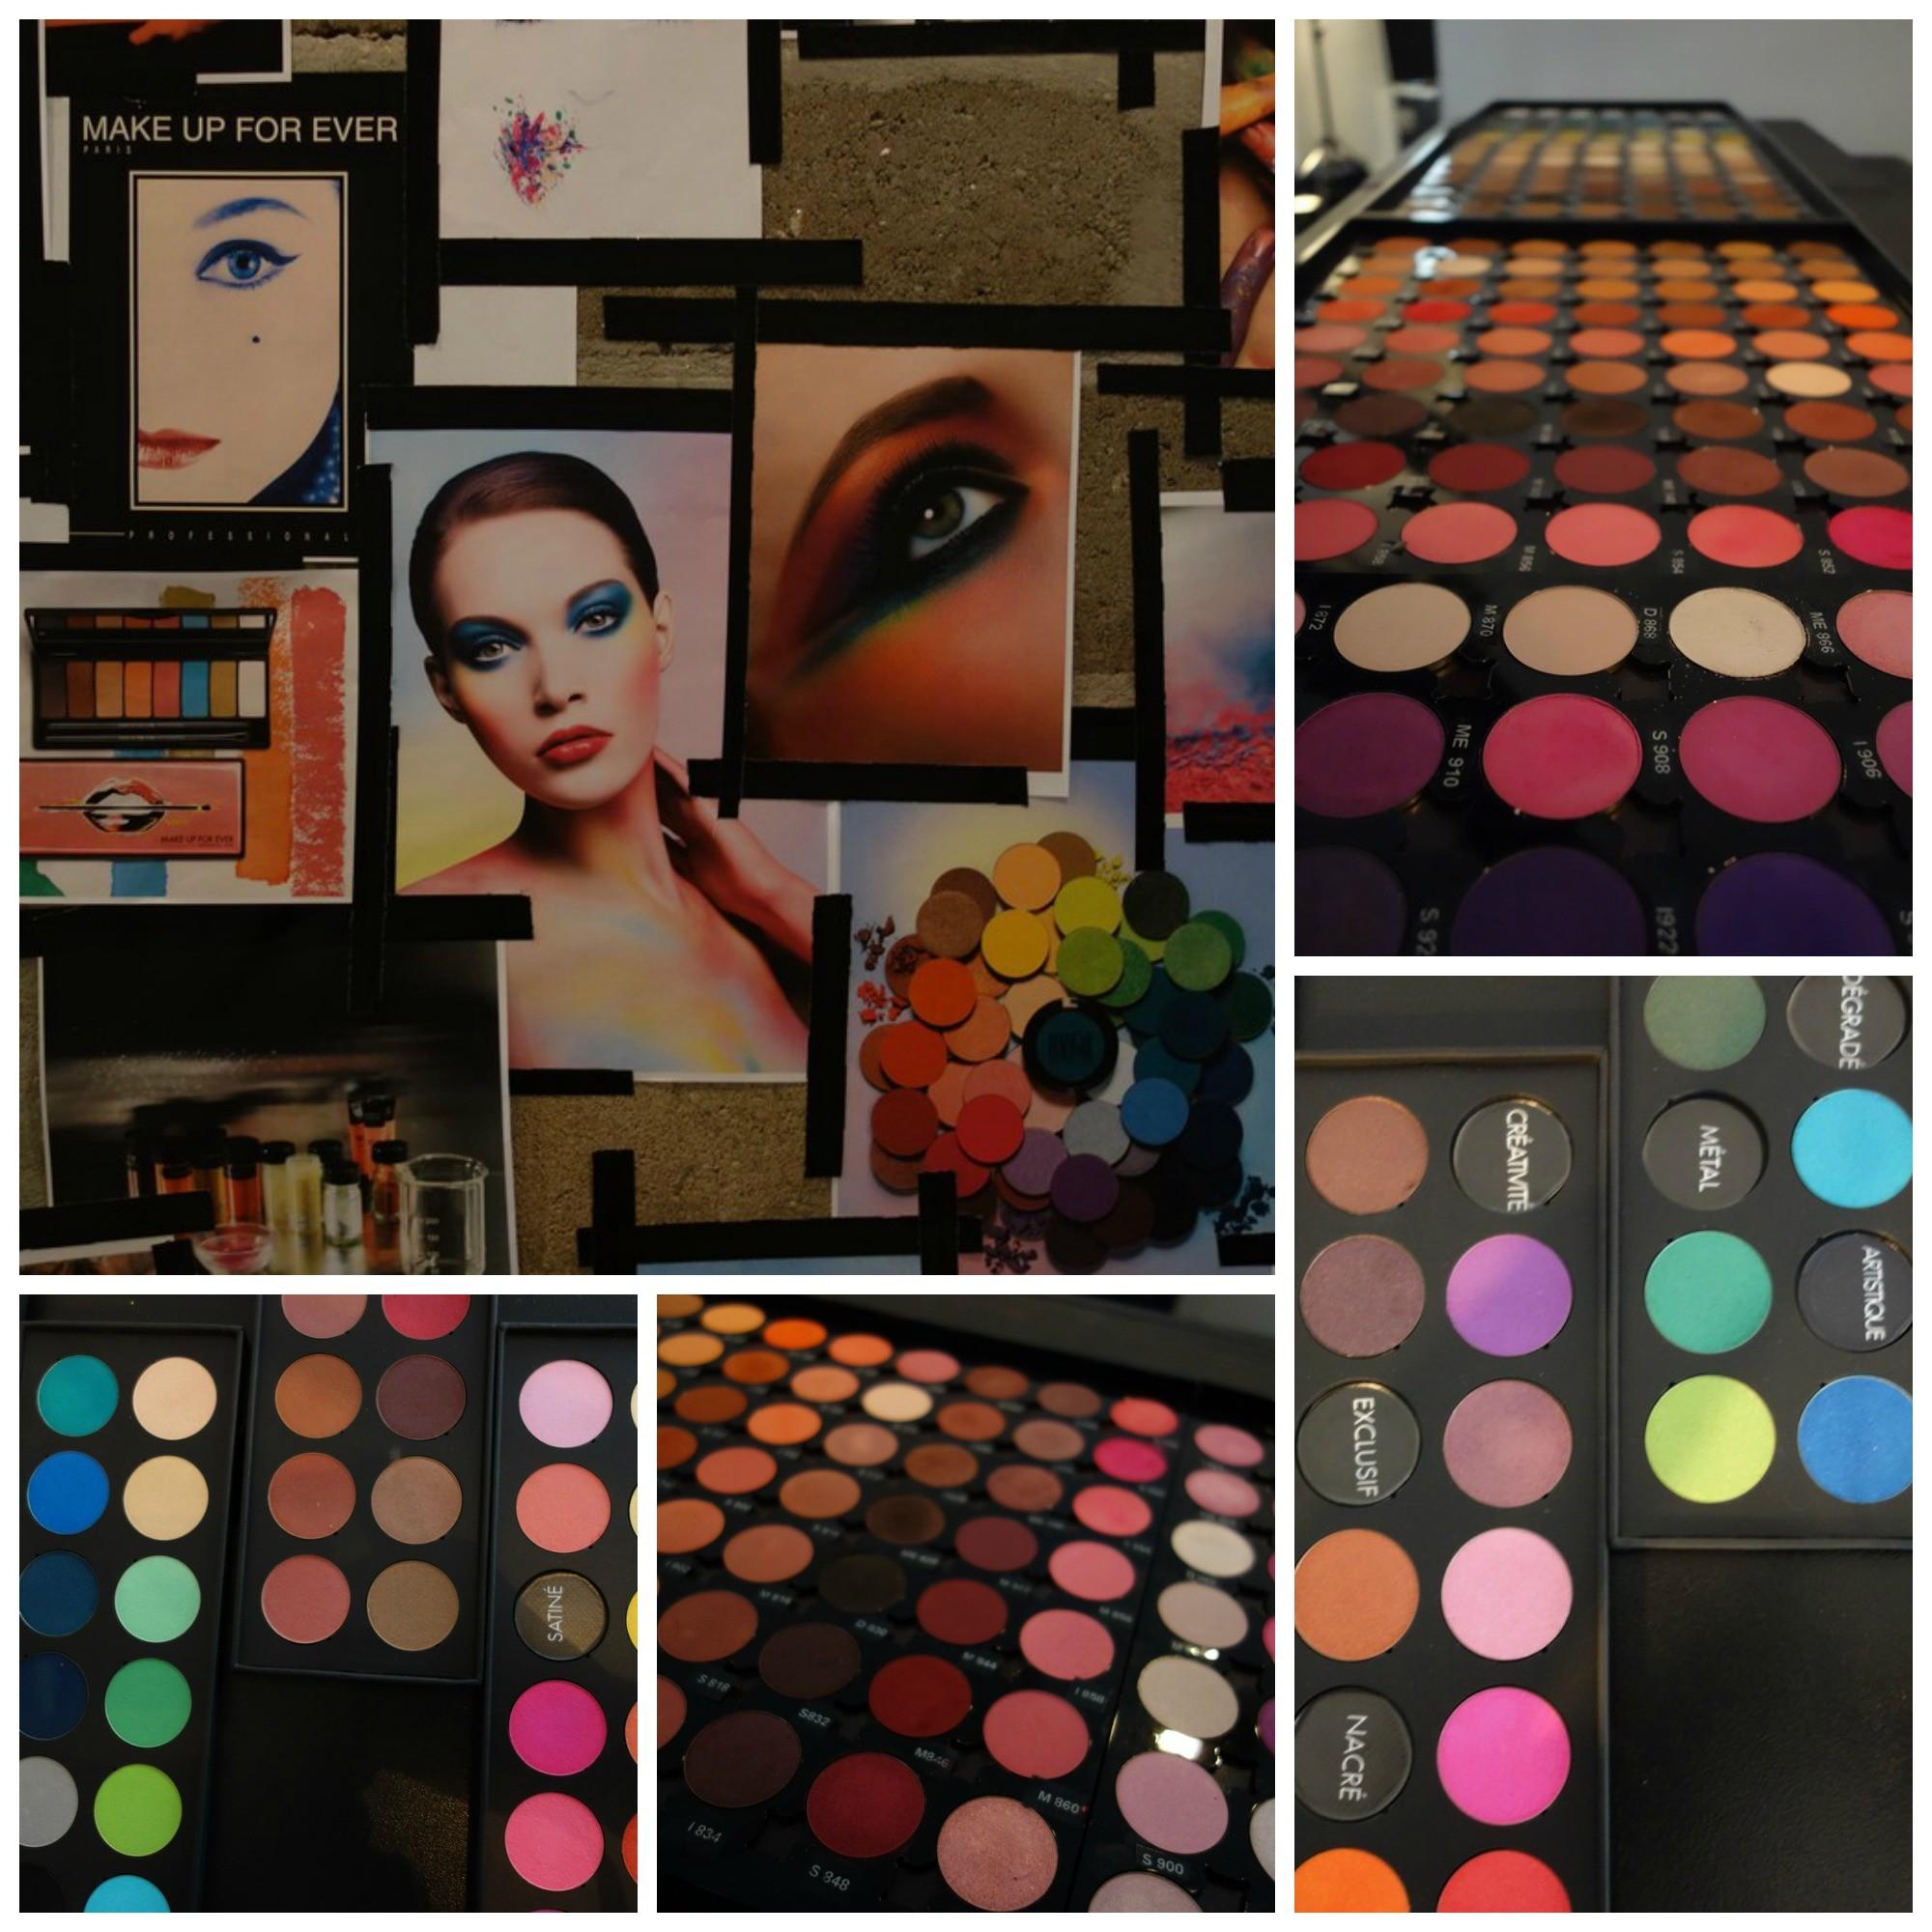 make up for ever maquillage Make Up For Ever : la marque de make up la plus arty a 30 ans